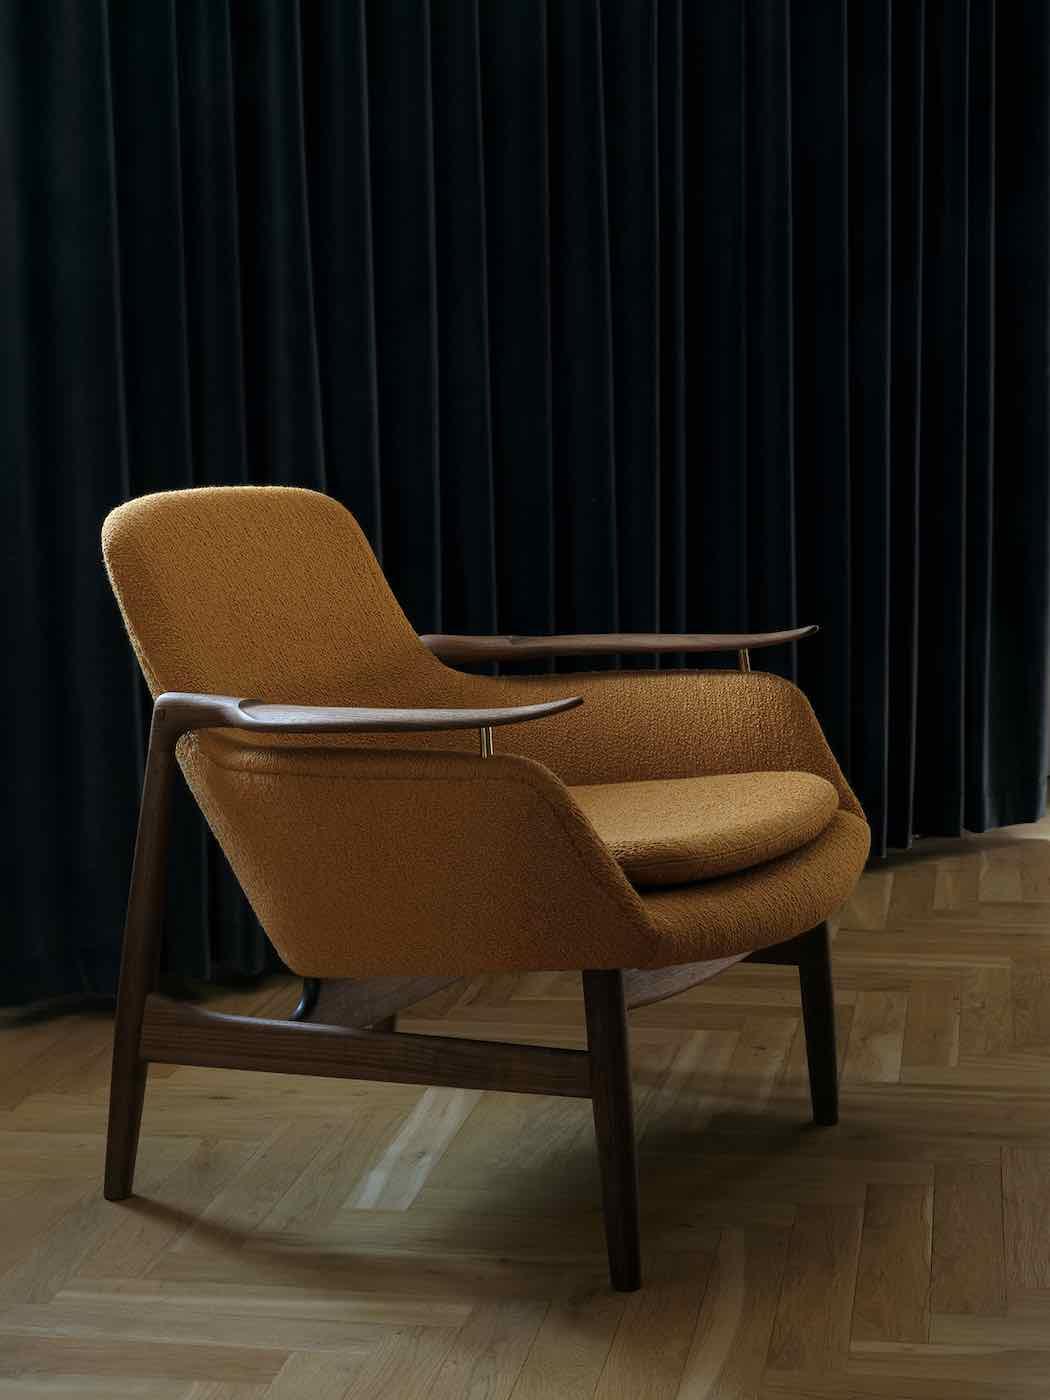 skandinavisches Sofa, Finn Juhl, FJ53, Skandinavischer Sessel, 3daysofdesign